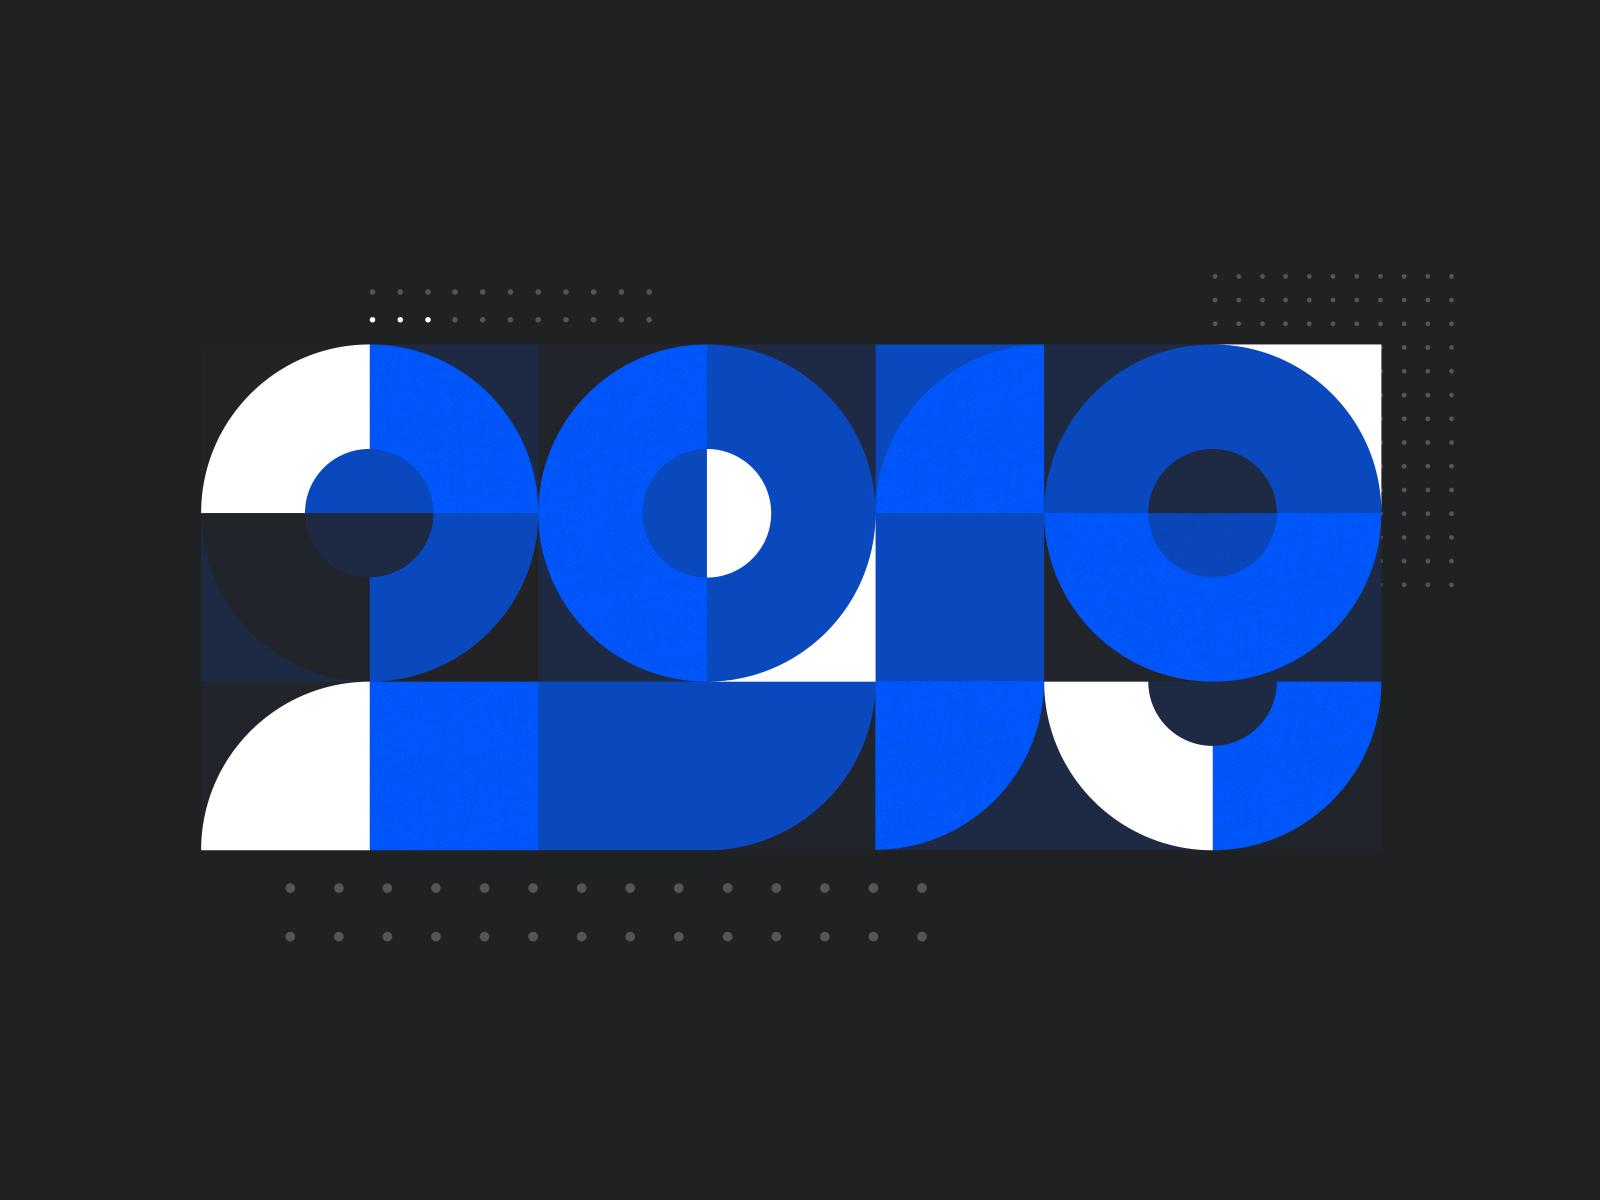 2019 v2